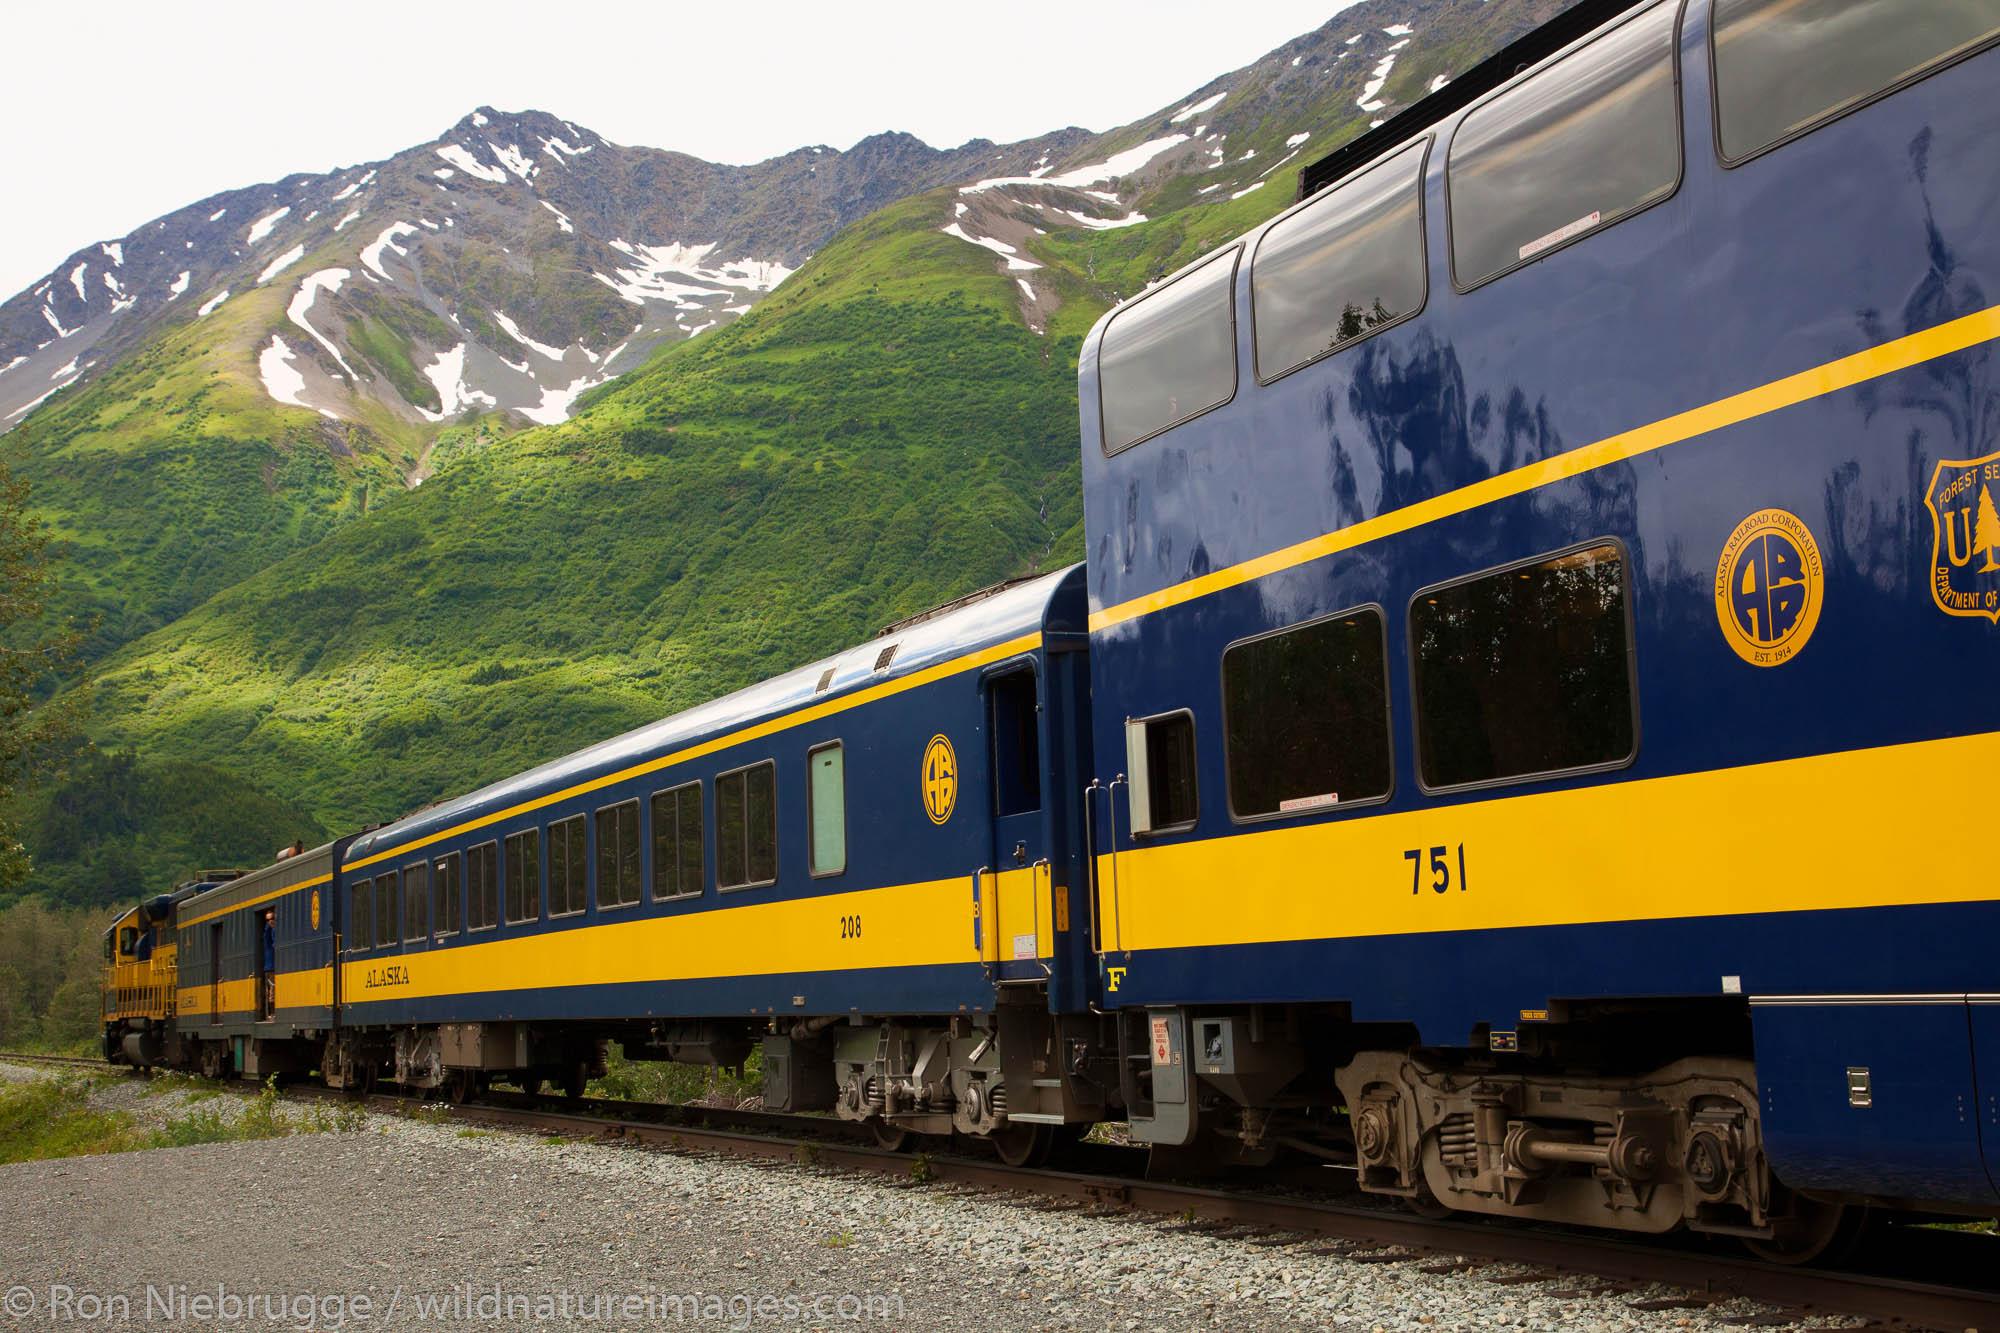 The train to Spencer Glacier, Chugach National Forest, Alaska.